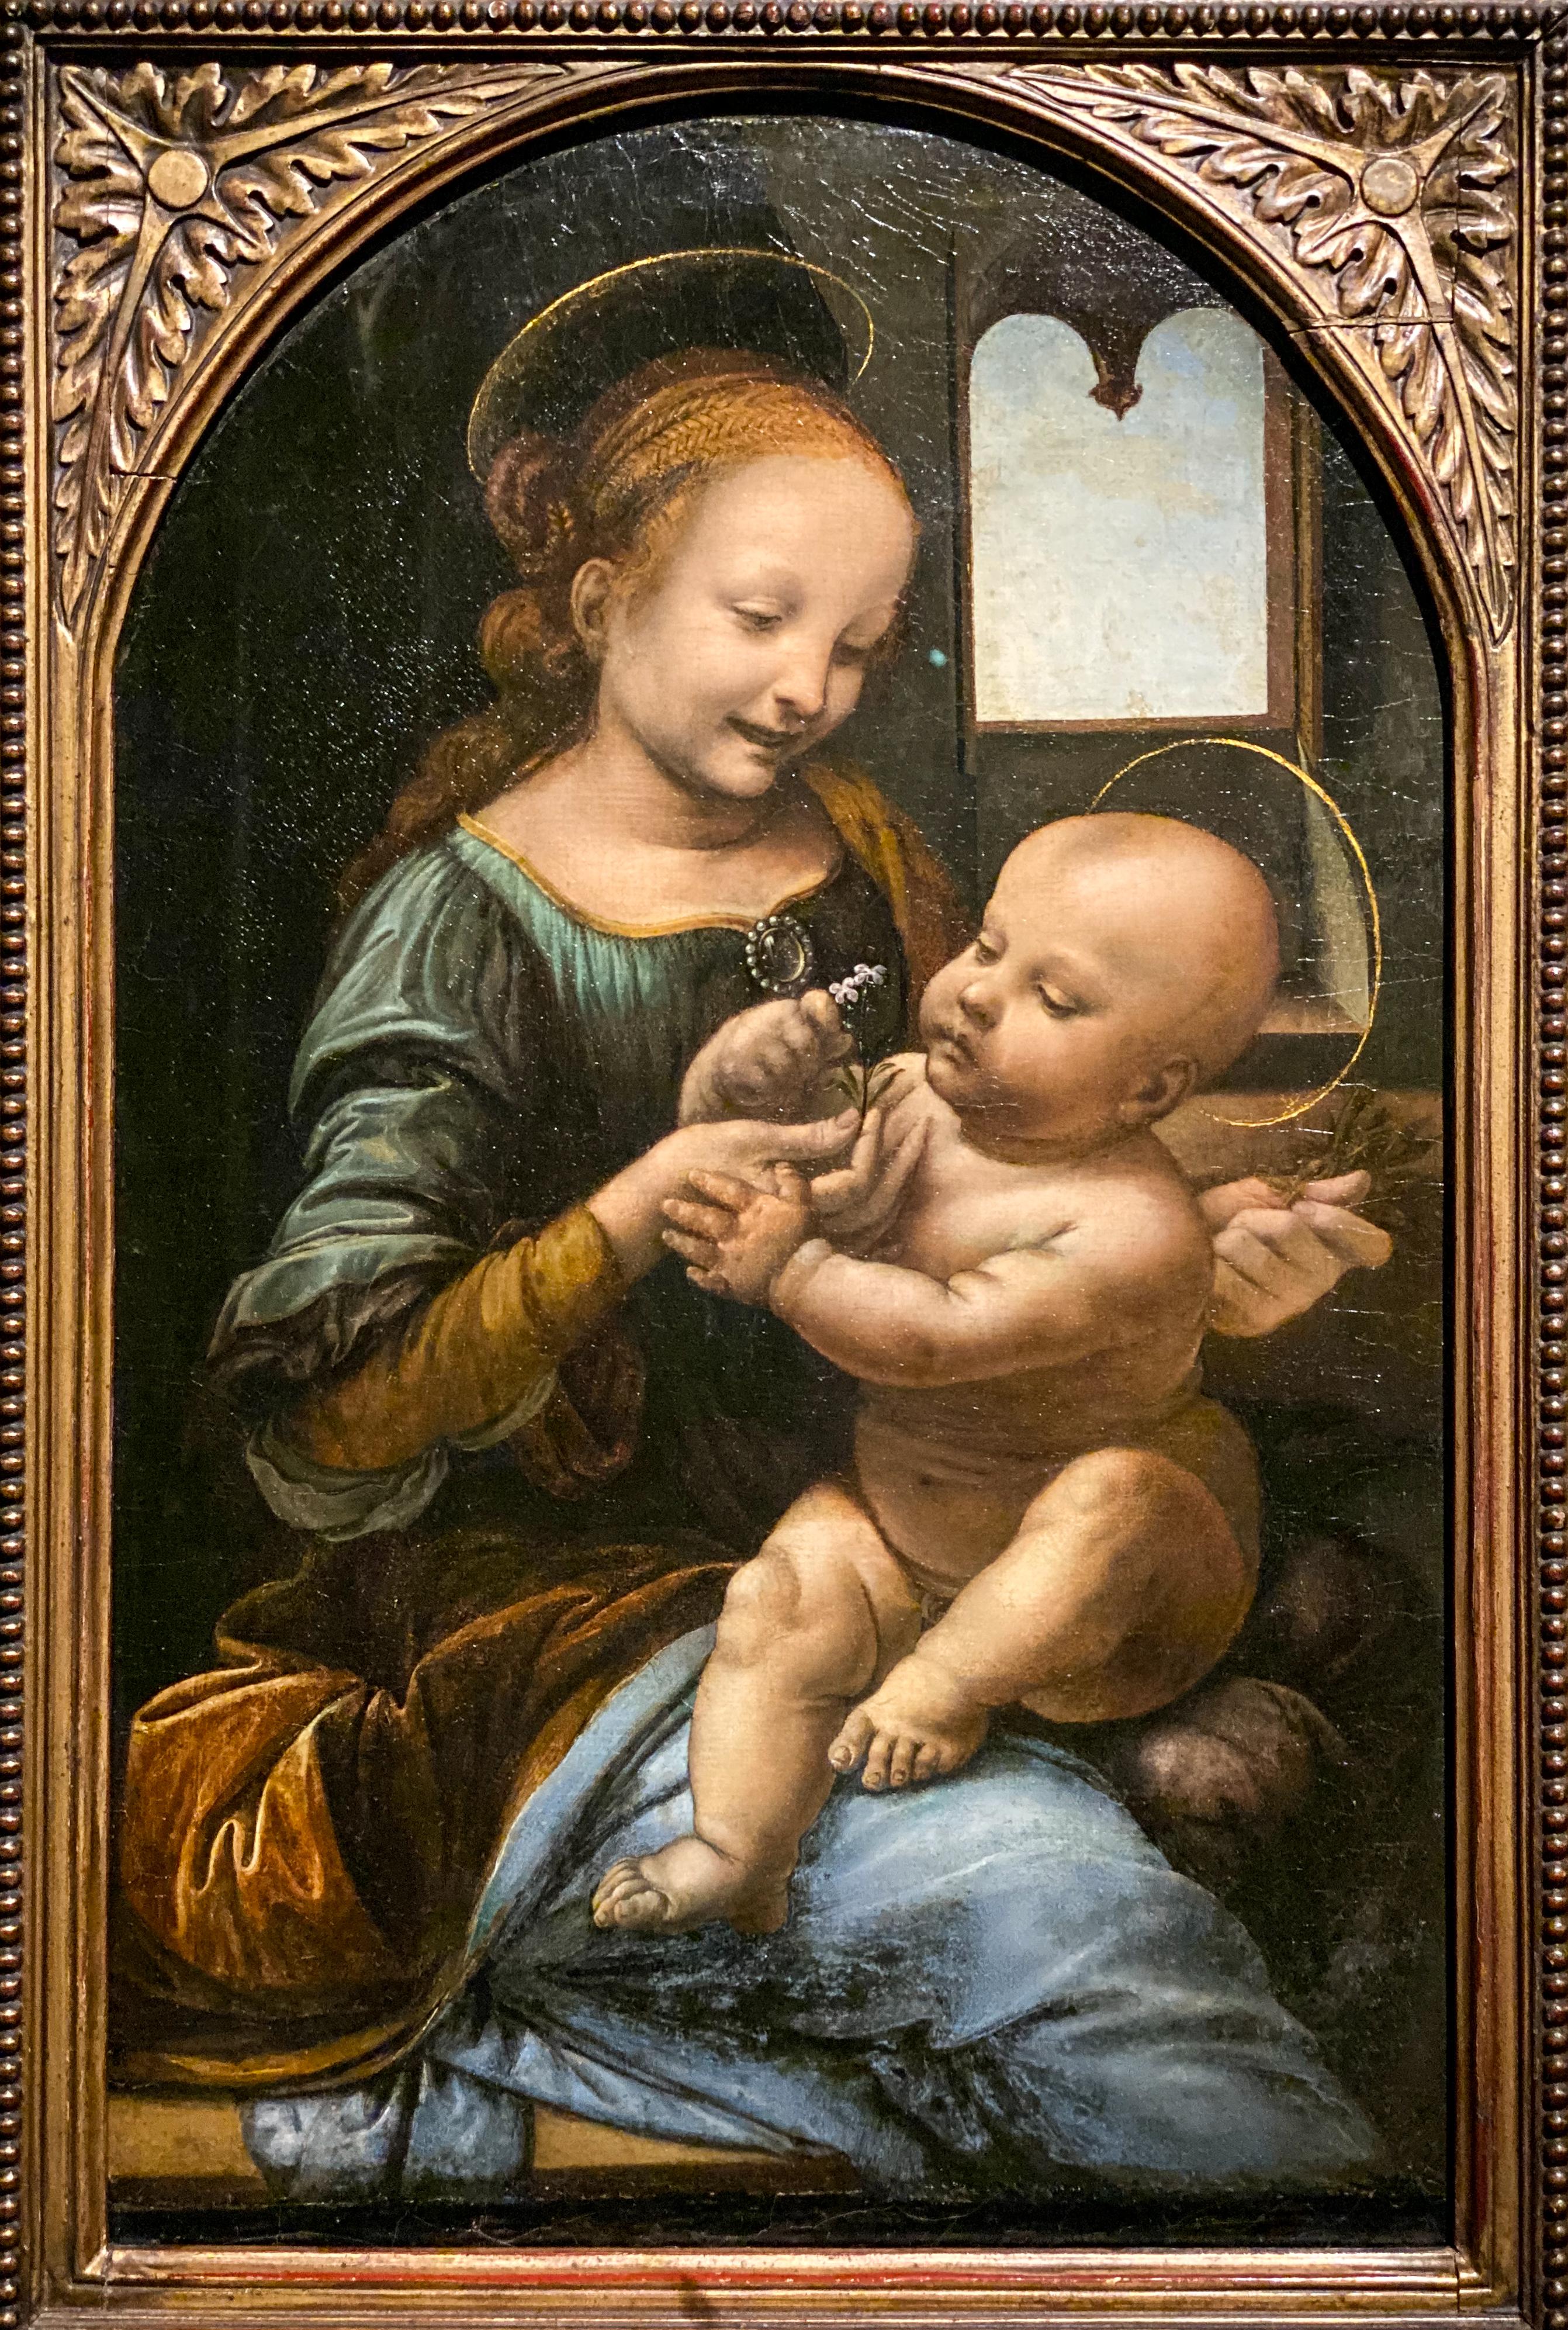 Leonardo da Vinci – Jahrhundertausstellung im Louvre Madonna Benois St. Petersburg